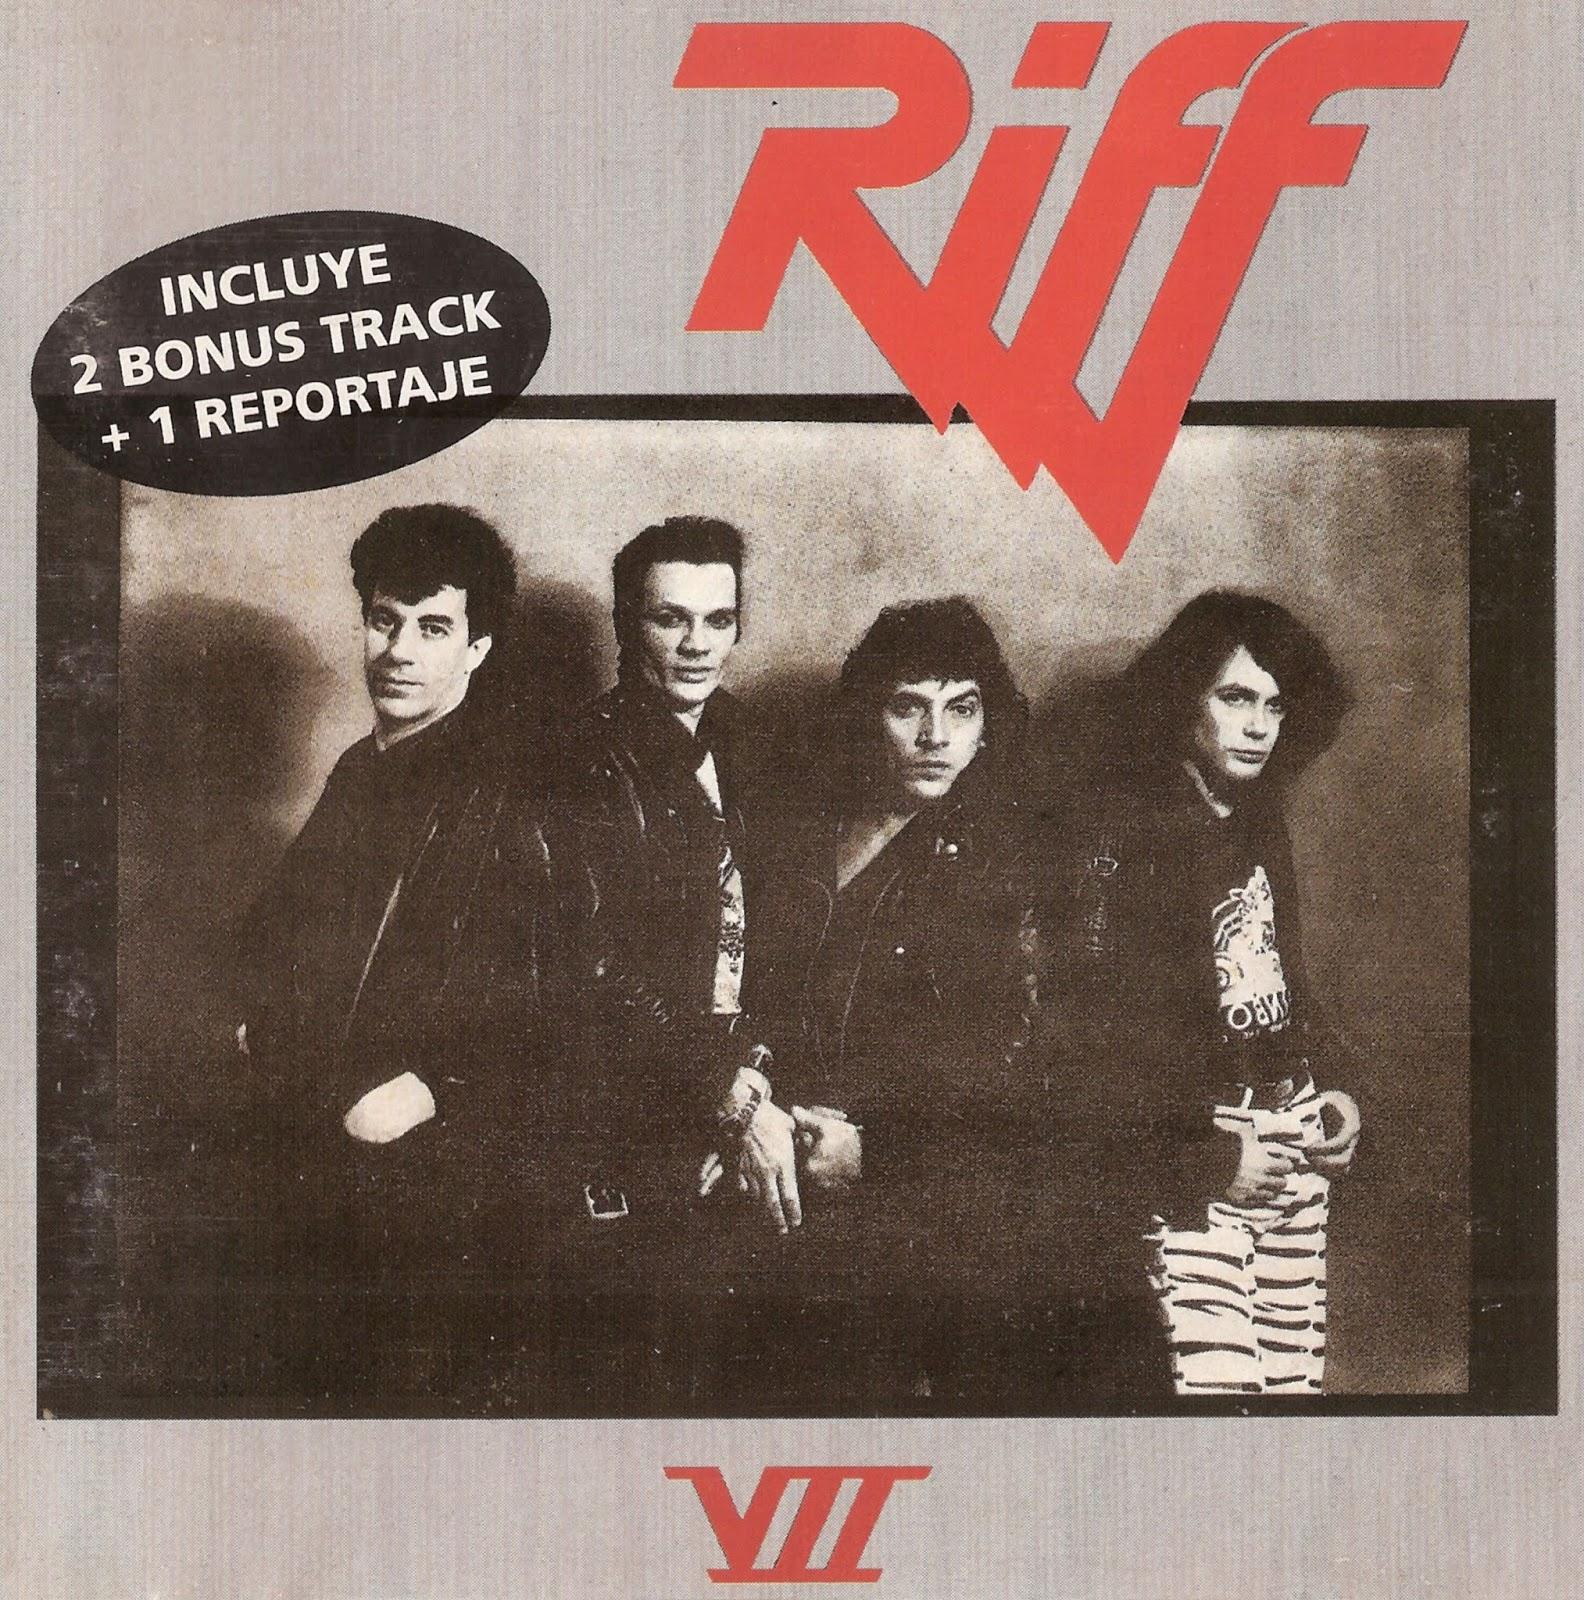 La Nave Del Rock Argento: Riff - Riff VII + Bonus (FLAC - 1985)